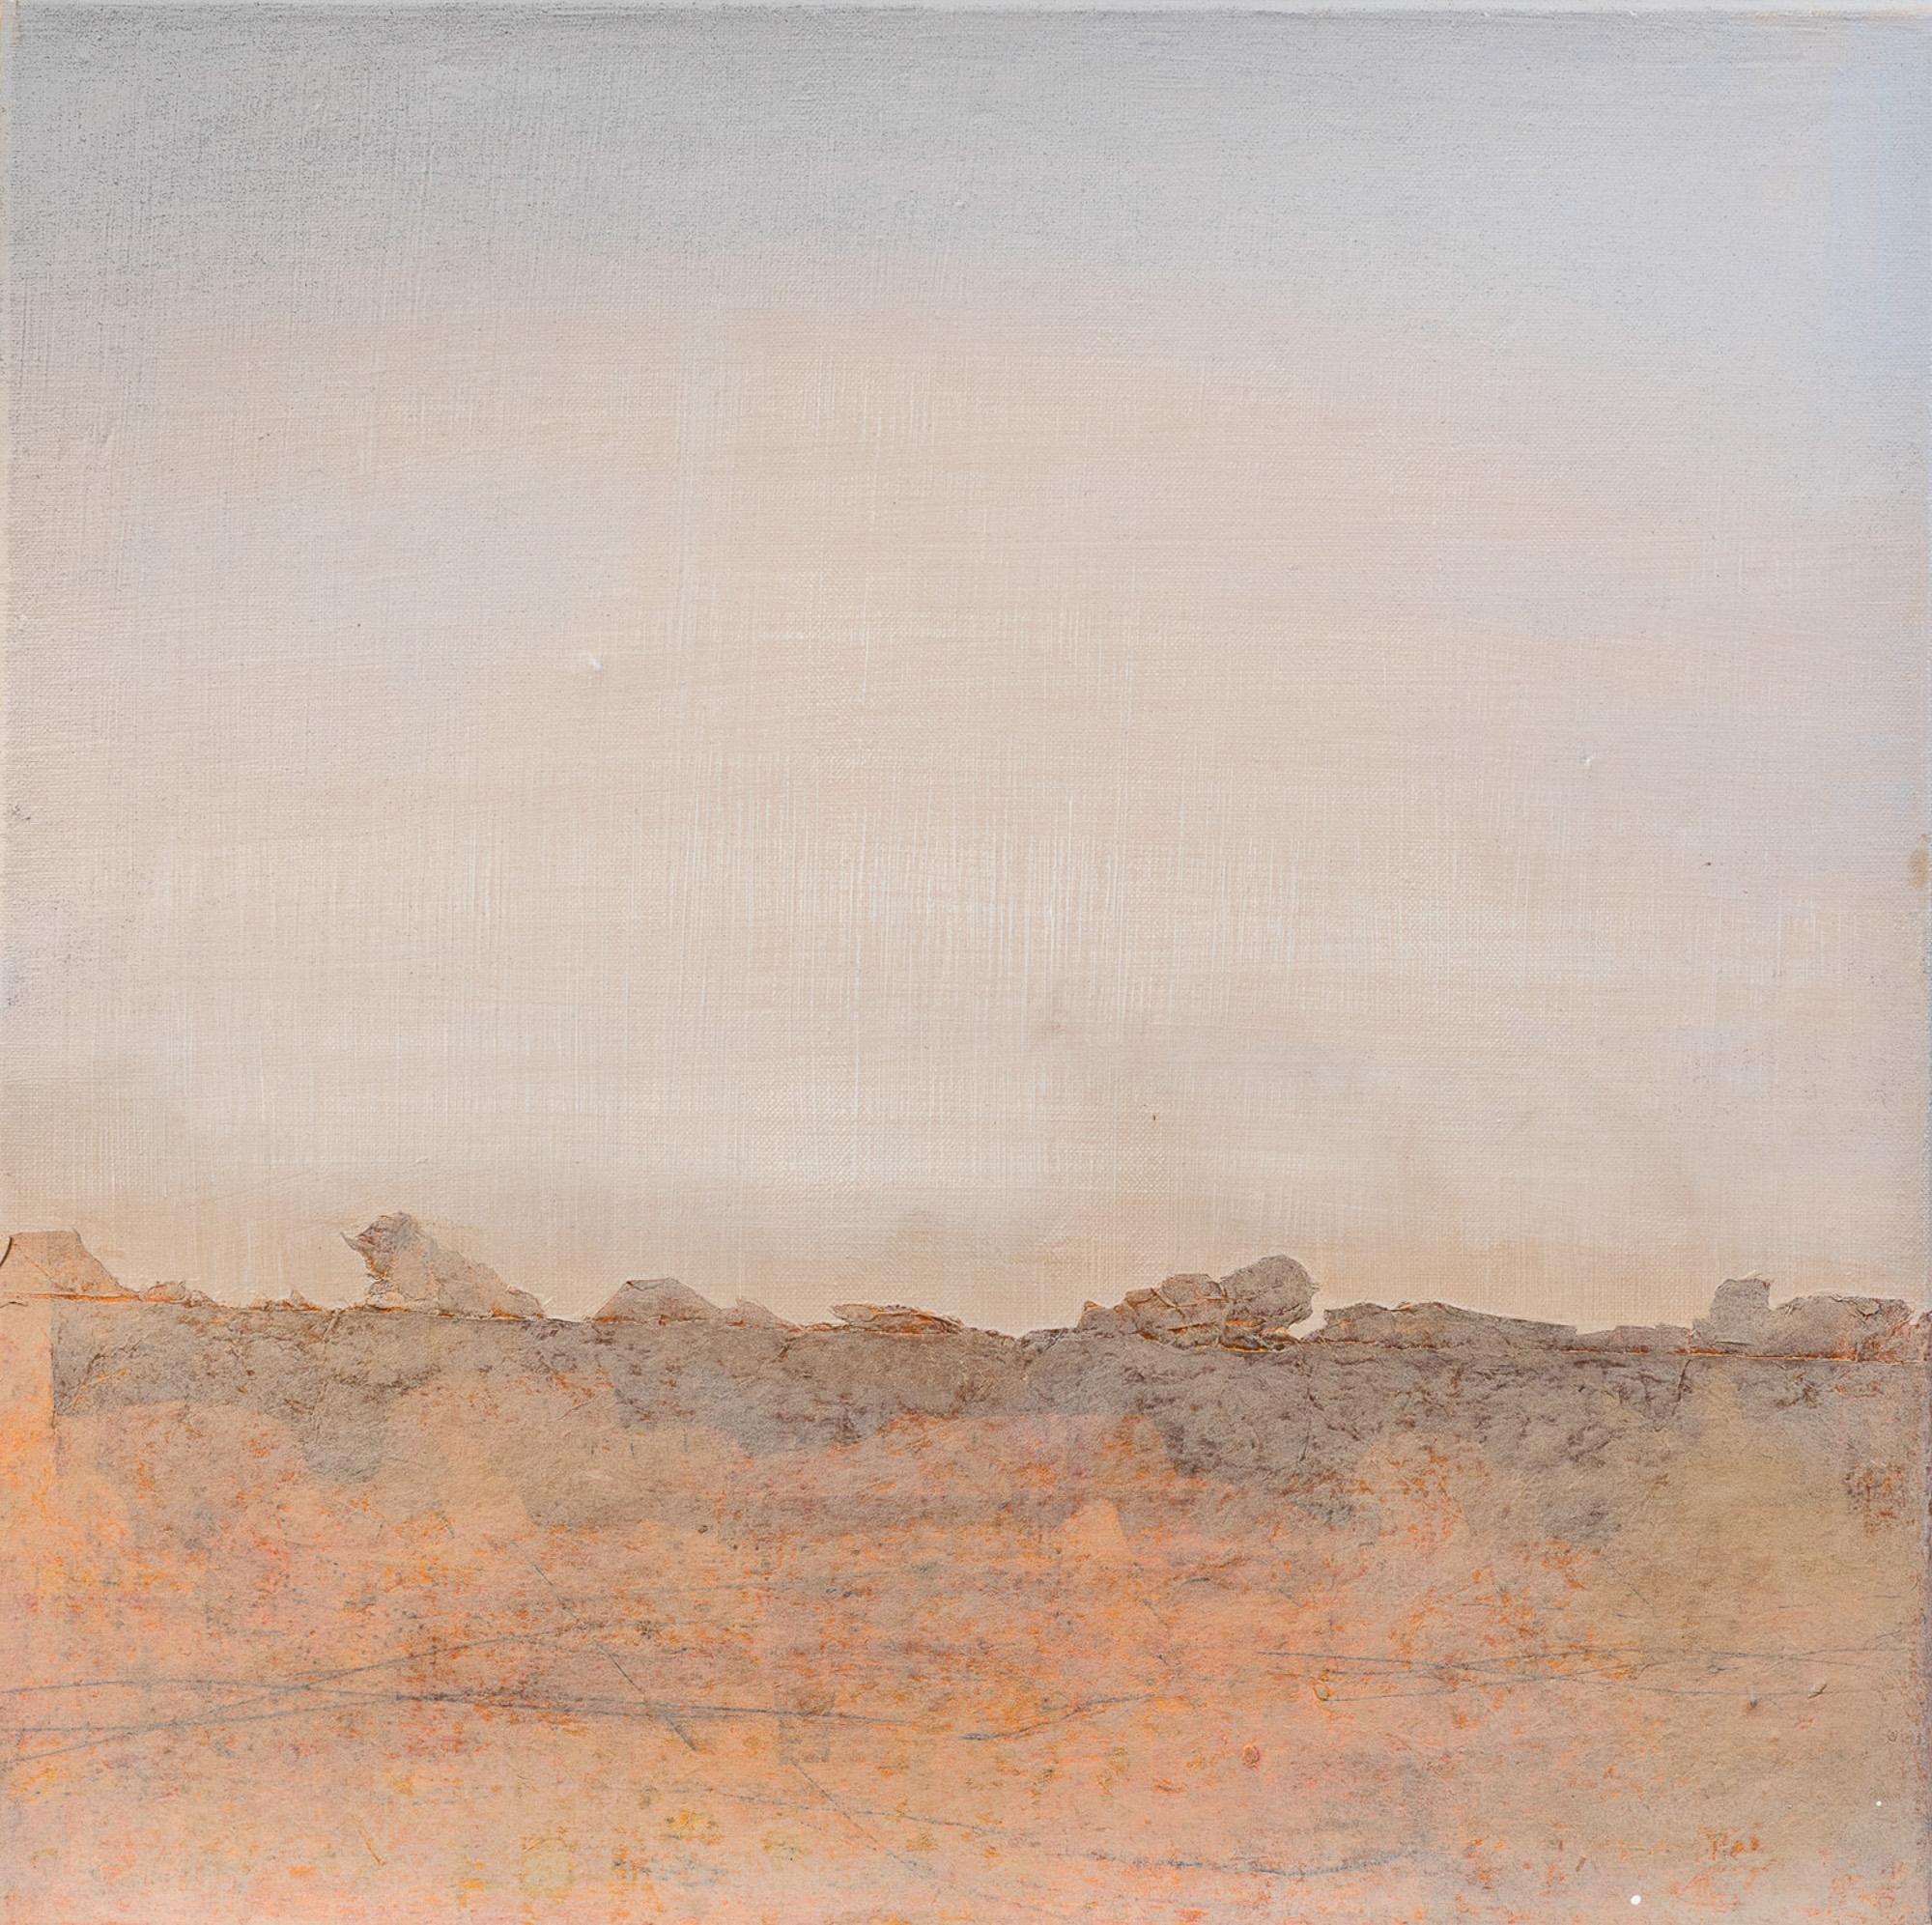 Silence II, 2017, techniques mixtes, 50x50cm